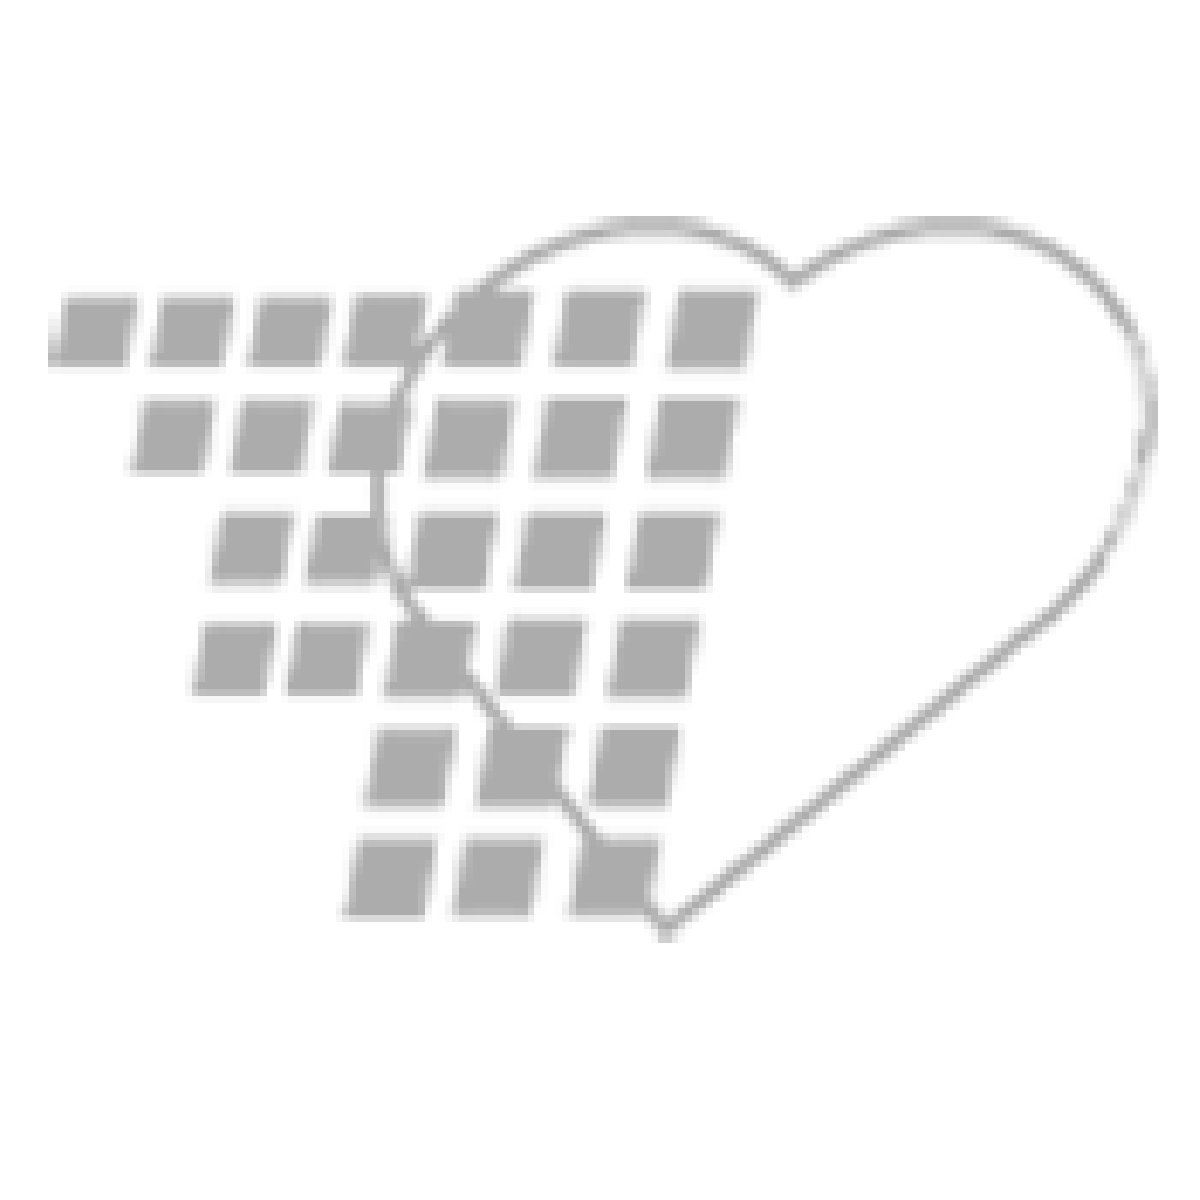 06-93-0325 - Demo Dose® Long Term Wellbutrn 100 mg Medication Pack